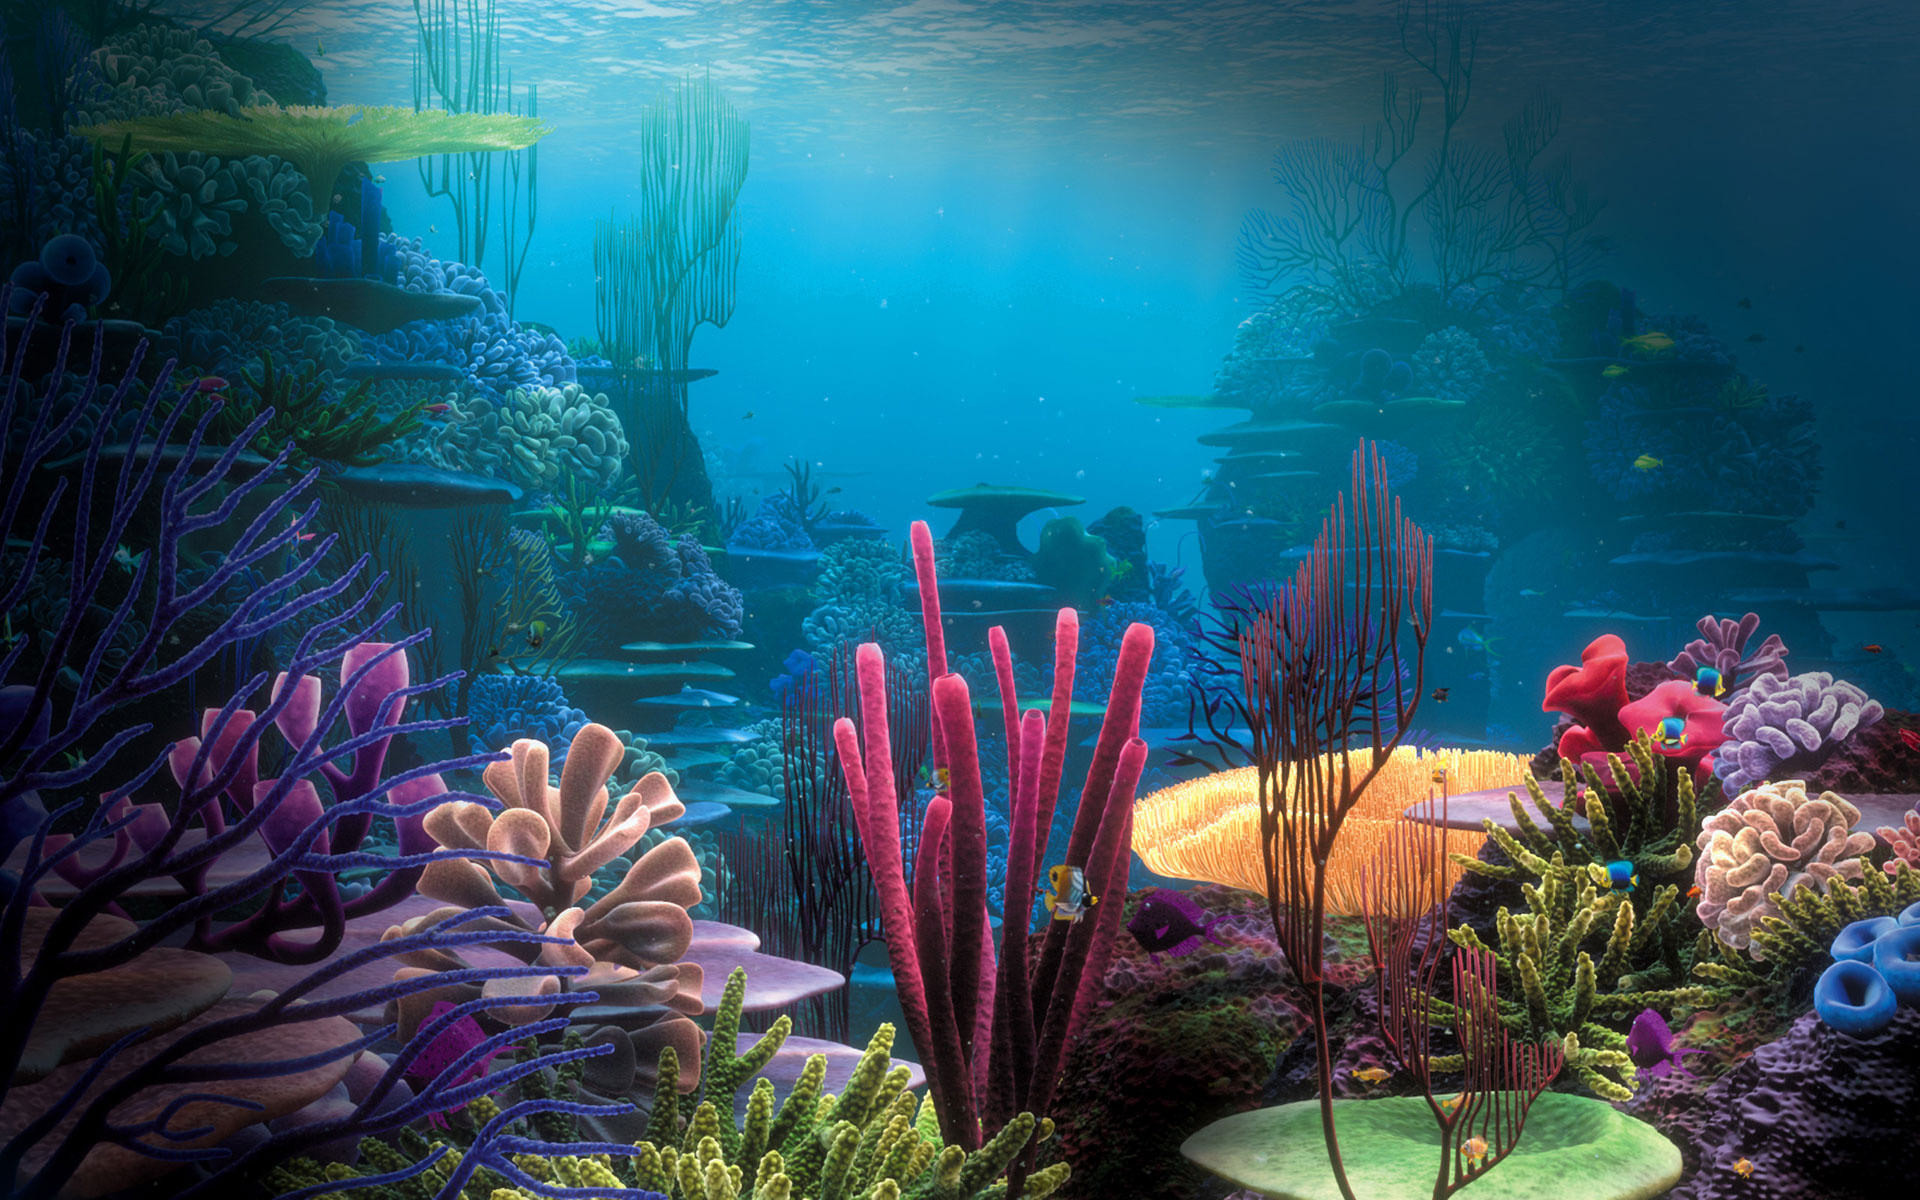 Full Size of Fish Tank Aquarium Backgrounds Wallpapers Freecreatives Free  Fishank Games Download Wallpaper Animated Screensaver …